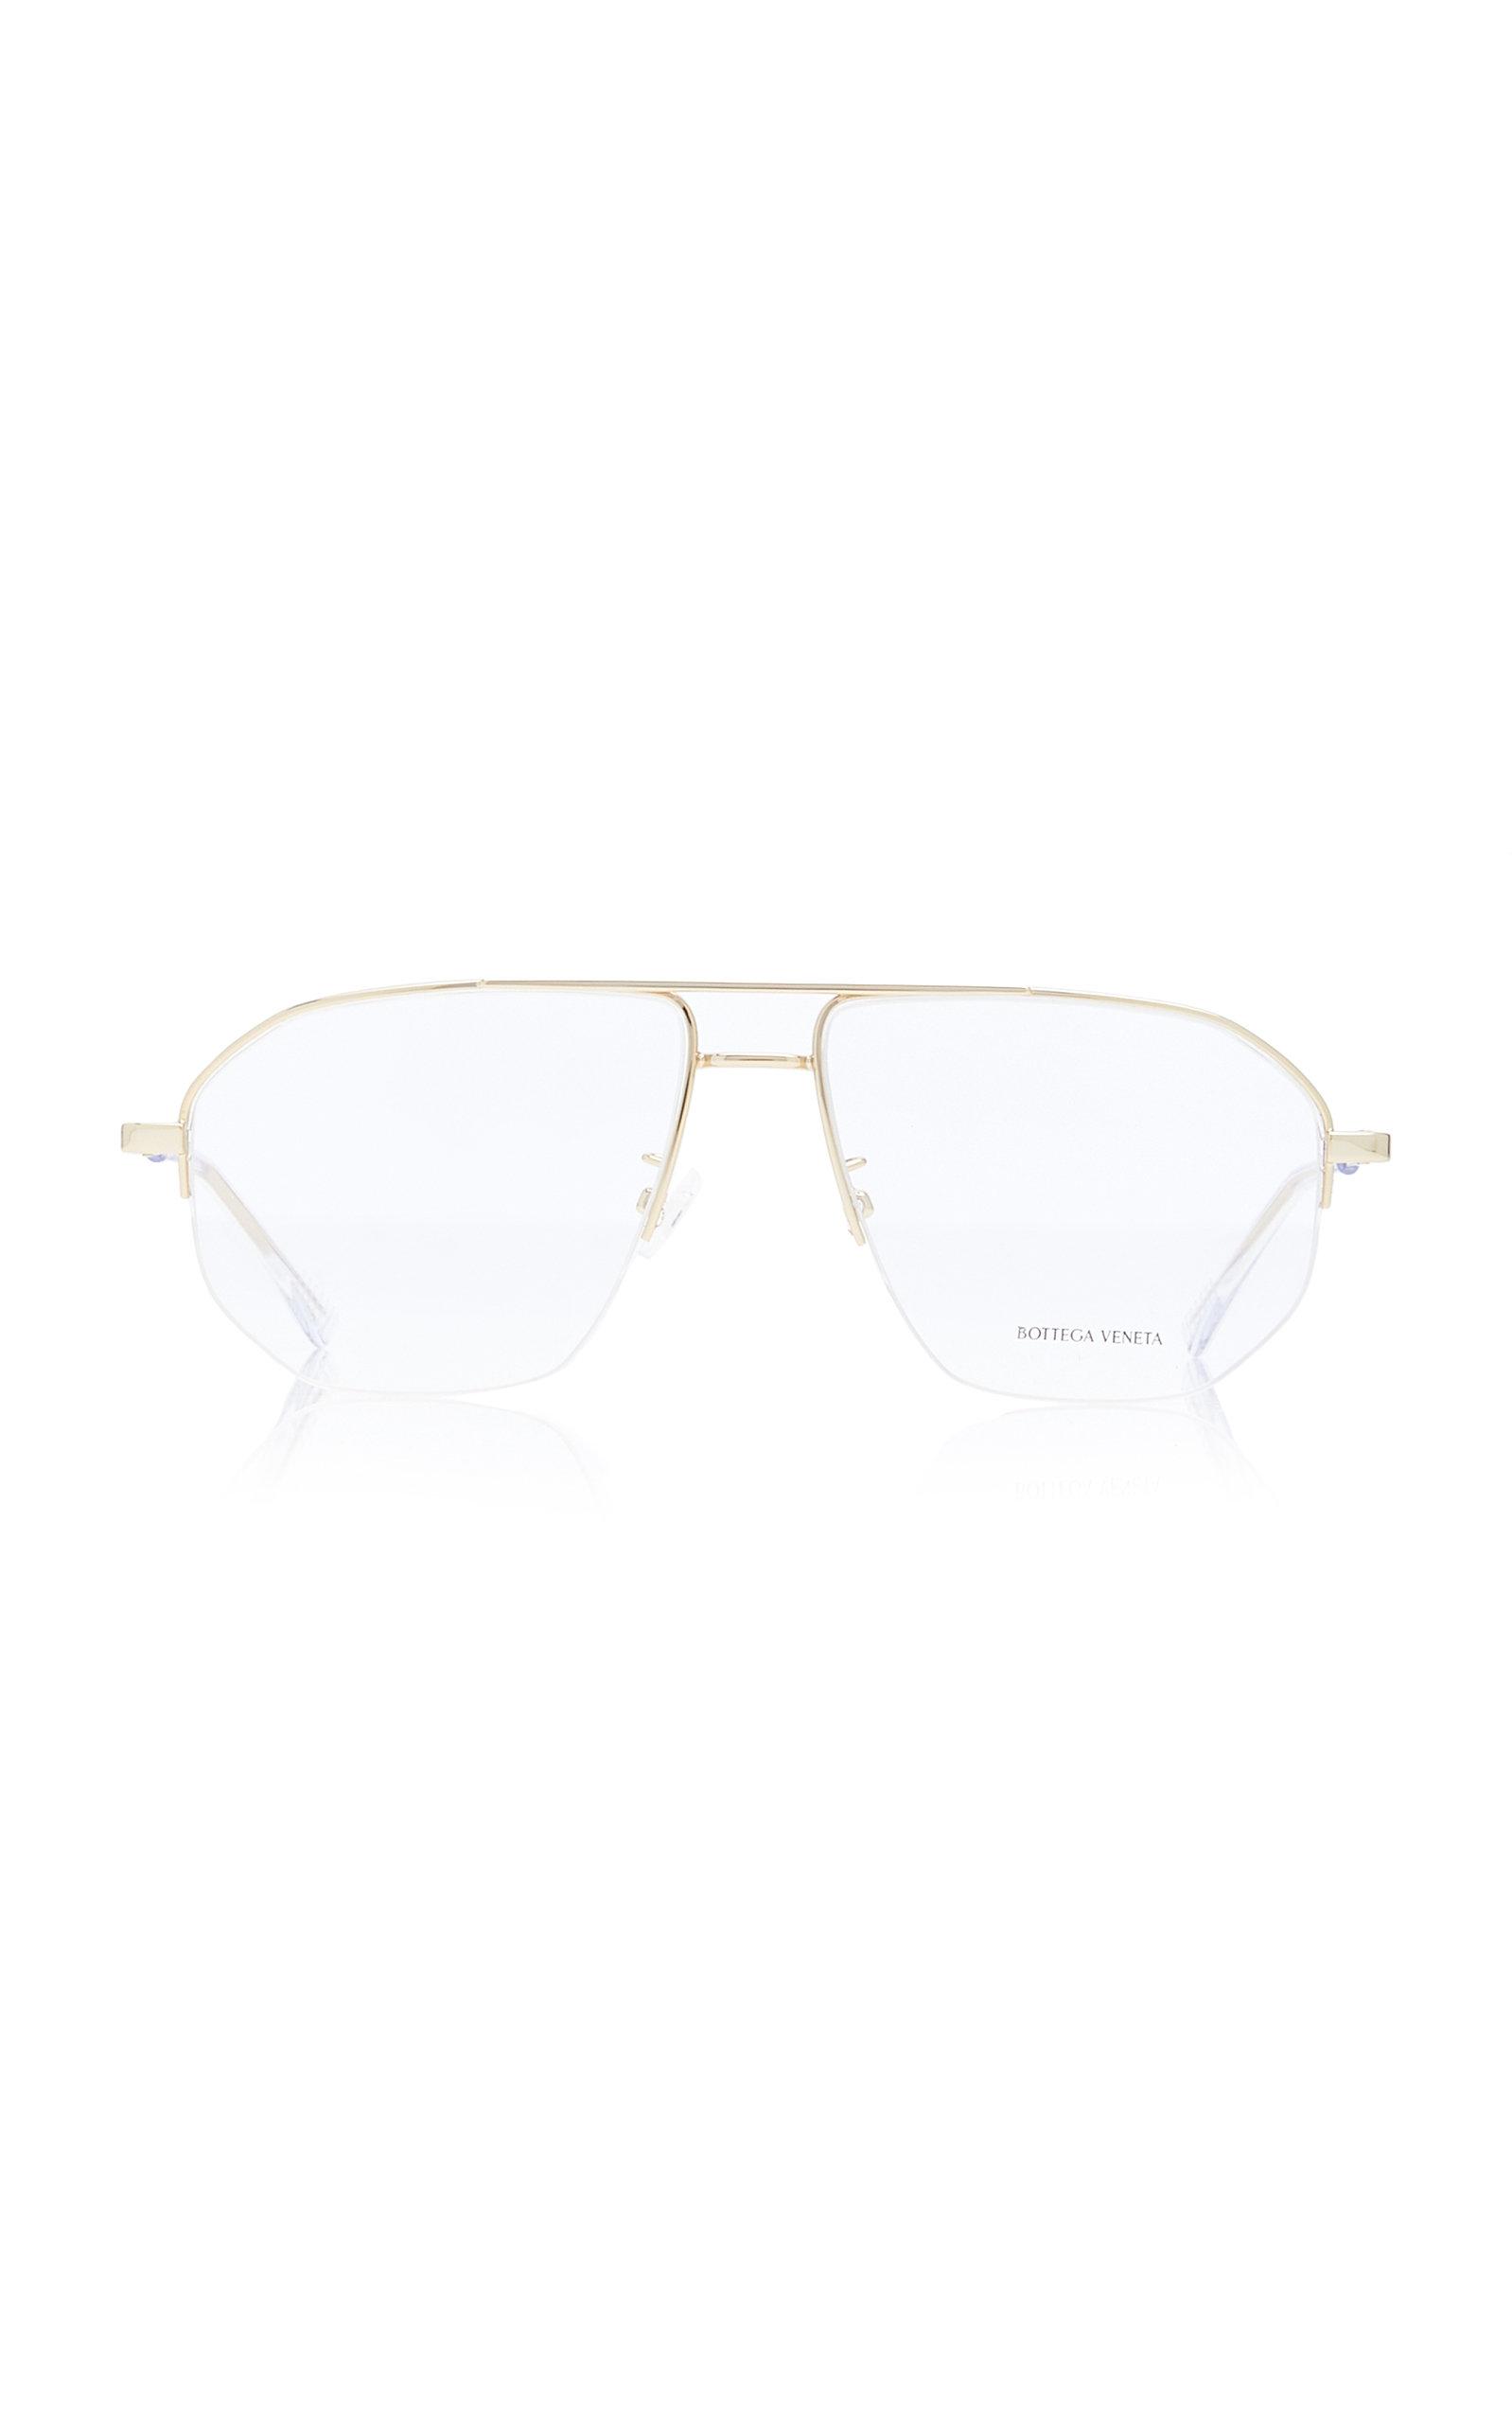 Bottega Veneta - Women's Aviator-Frame Metal Glasses - Gold - Moda Operandi